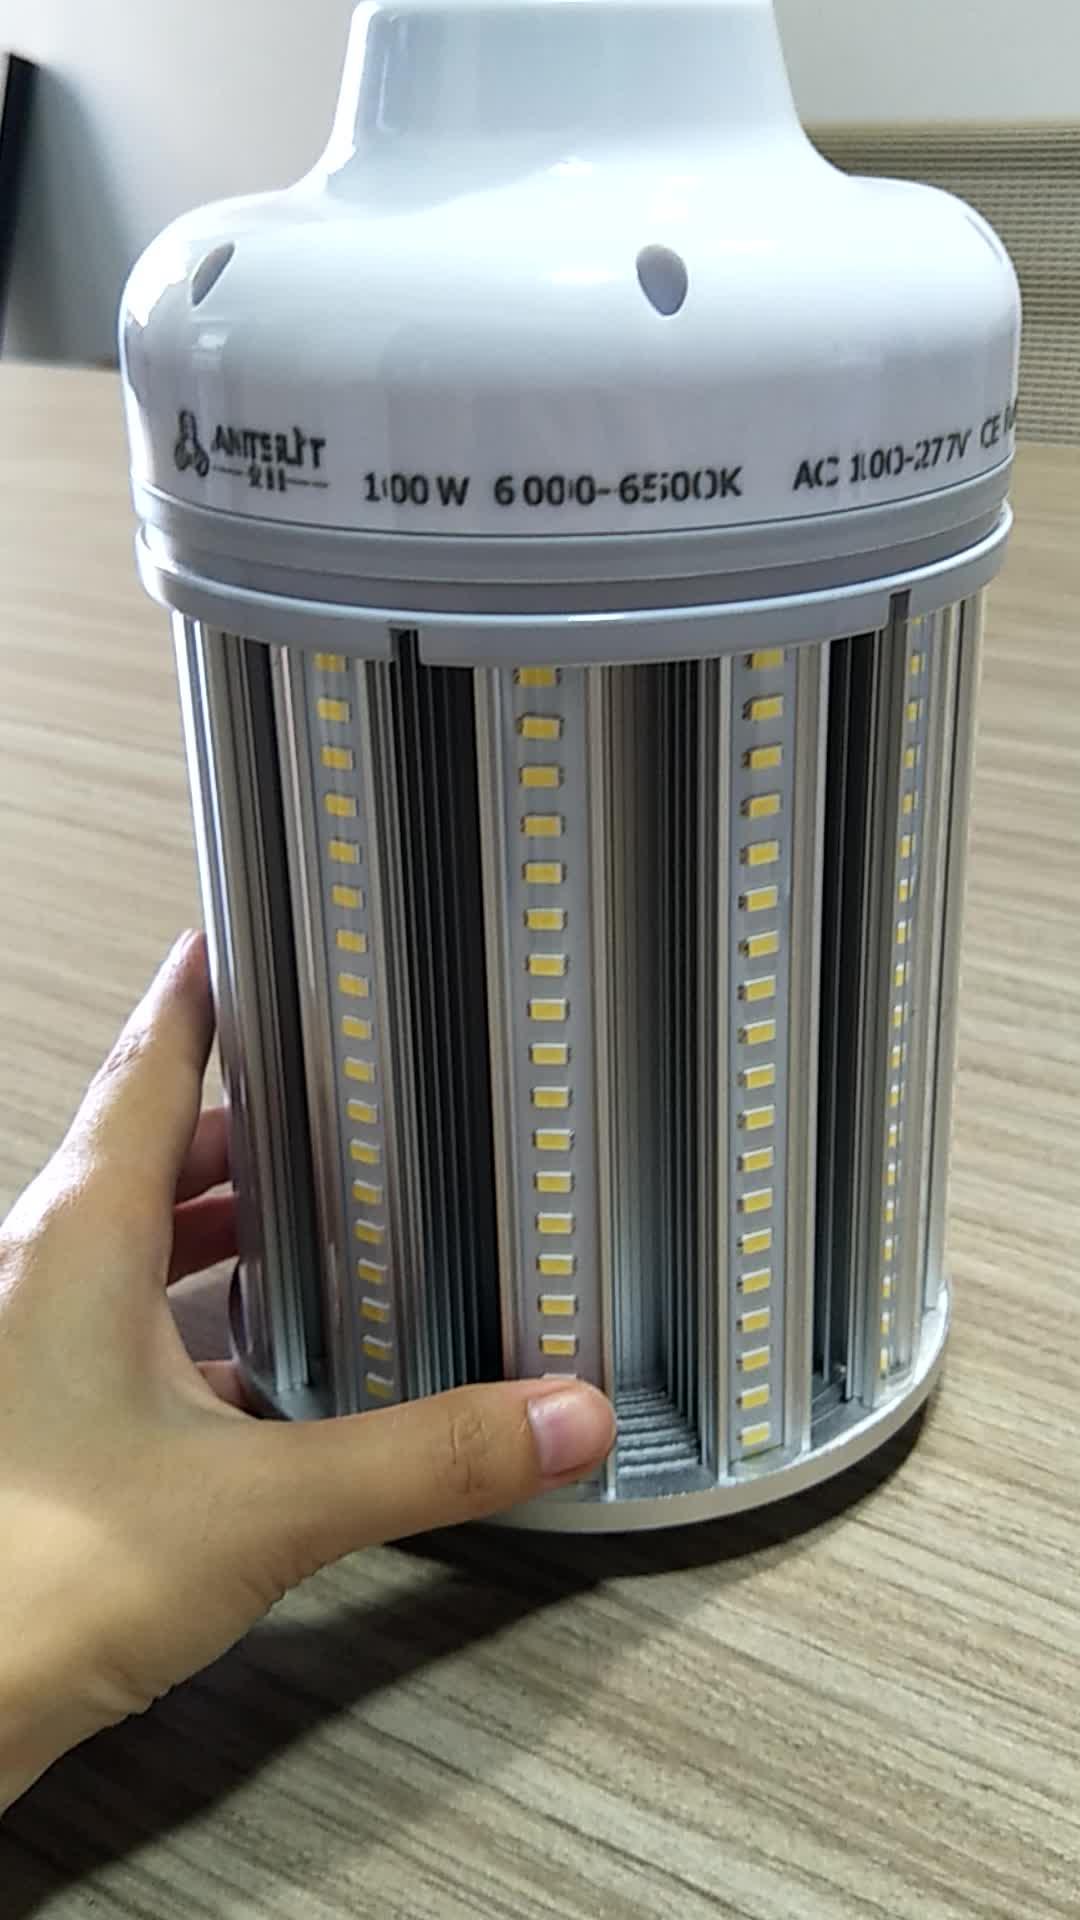 import light bulbs led 200w cfl 400w metal halide led replacement lamp e27 e40 100w led corn. Black Bedroom Furniture Sets. Home Design Ideas